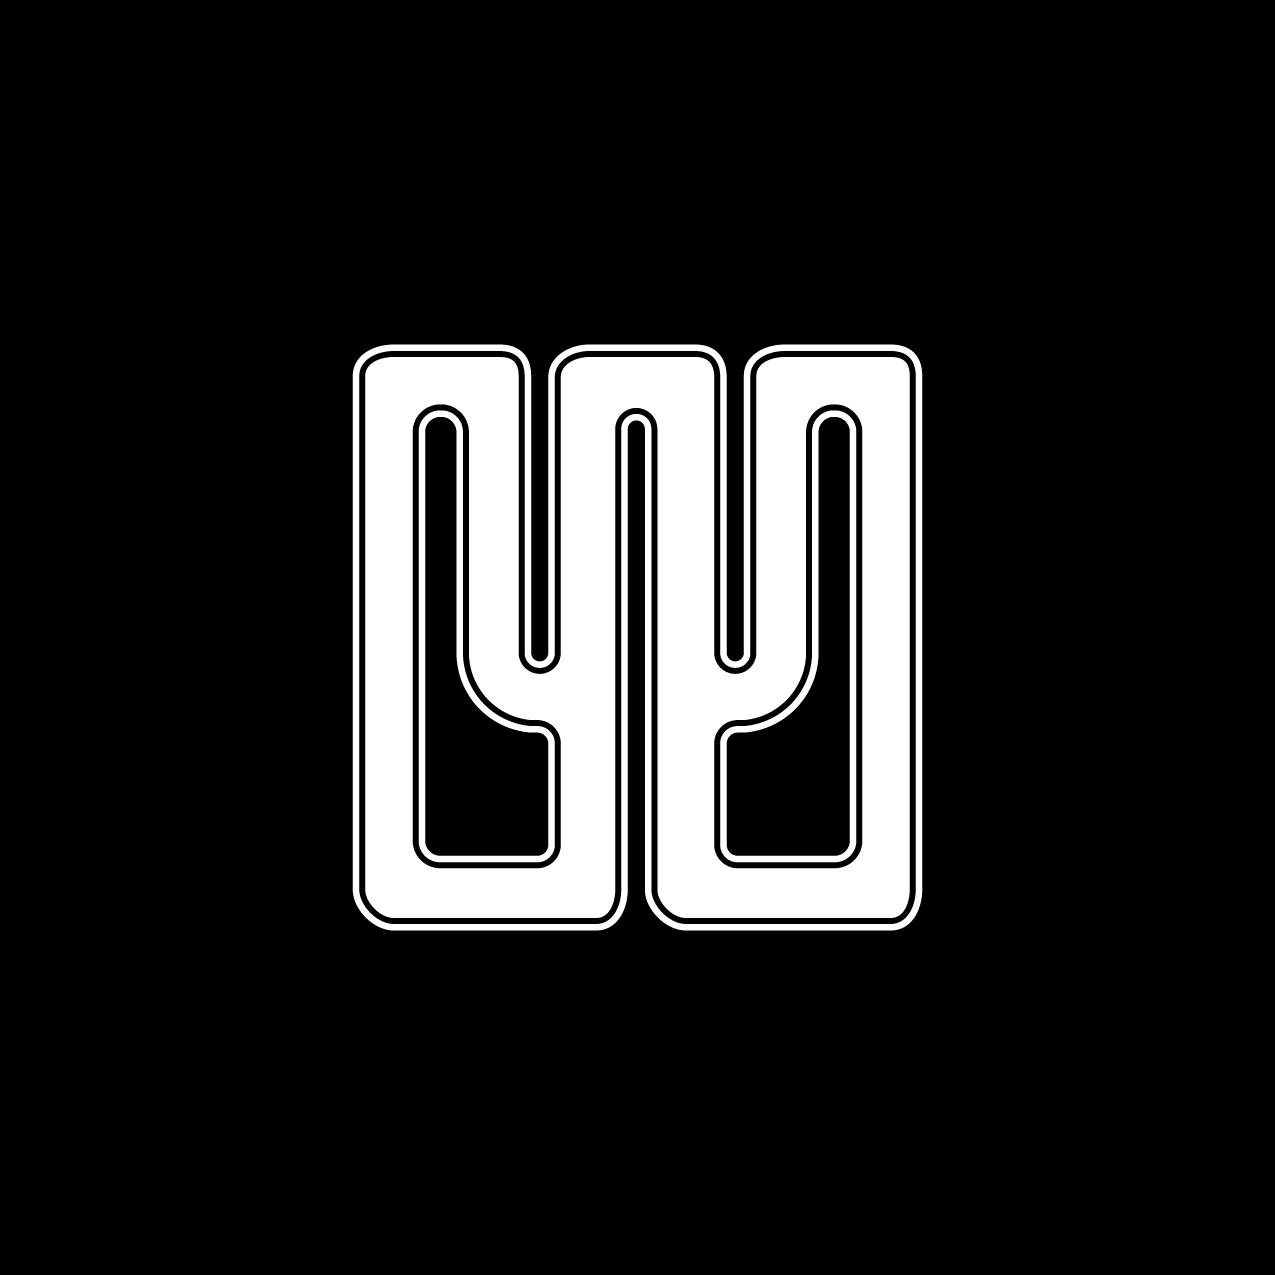 Letter W7 Design by Furia